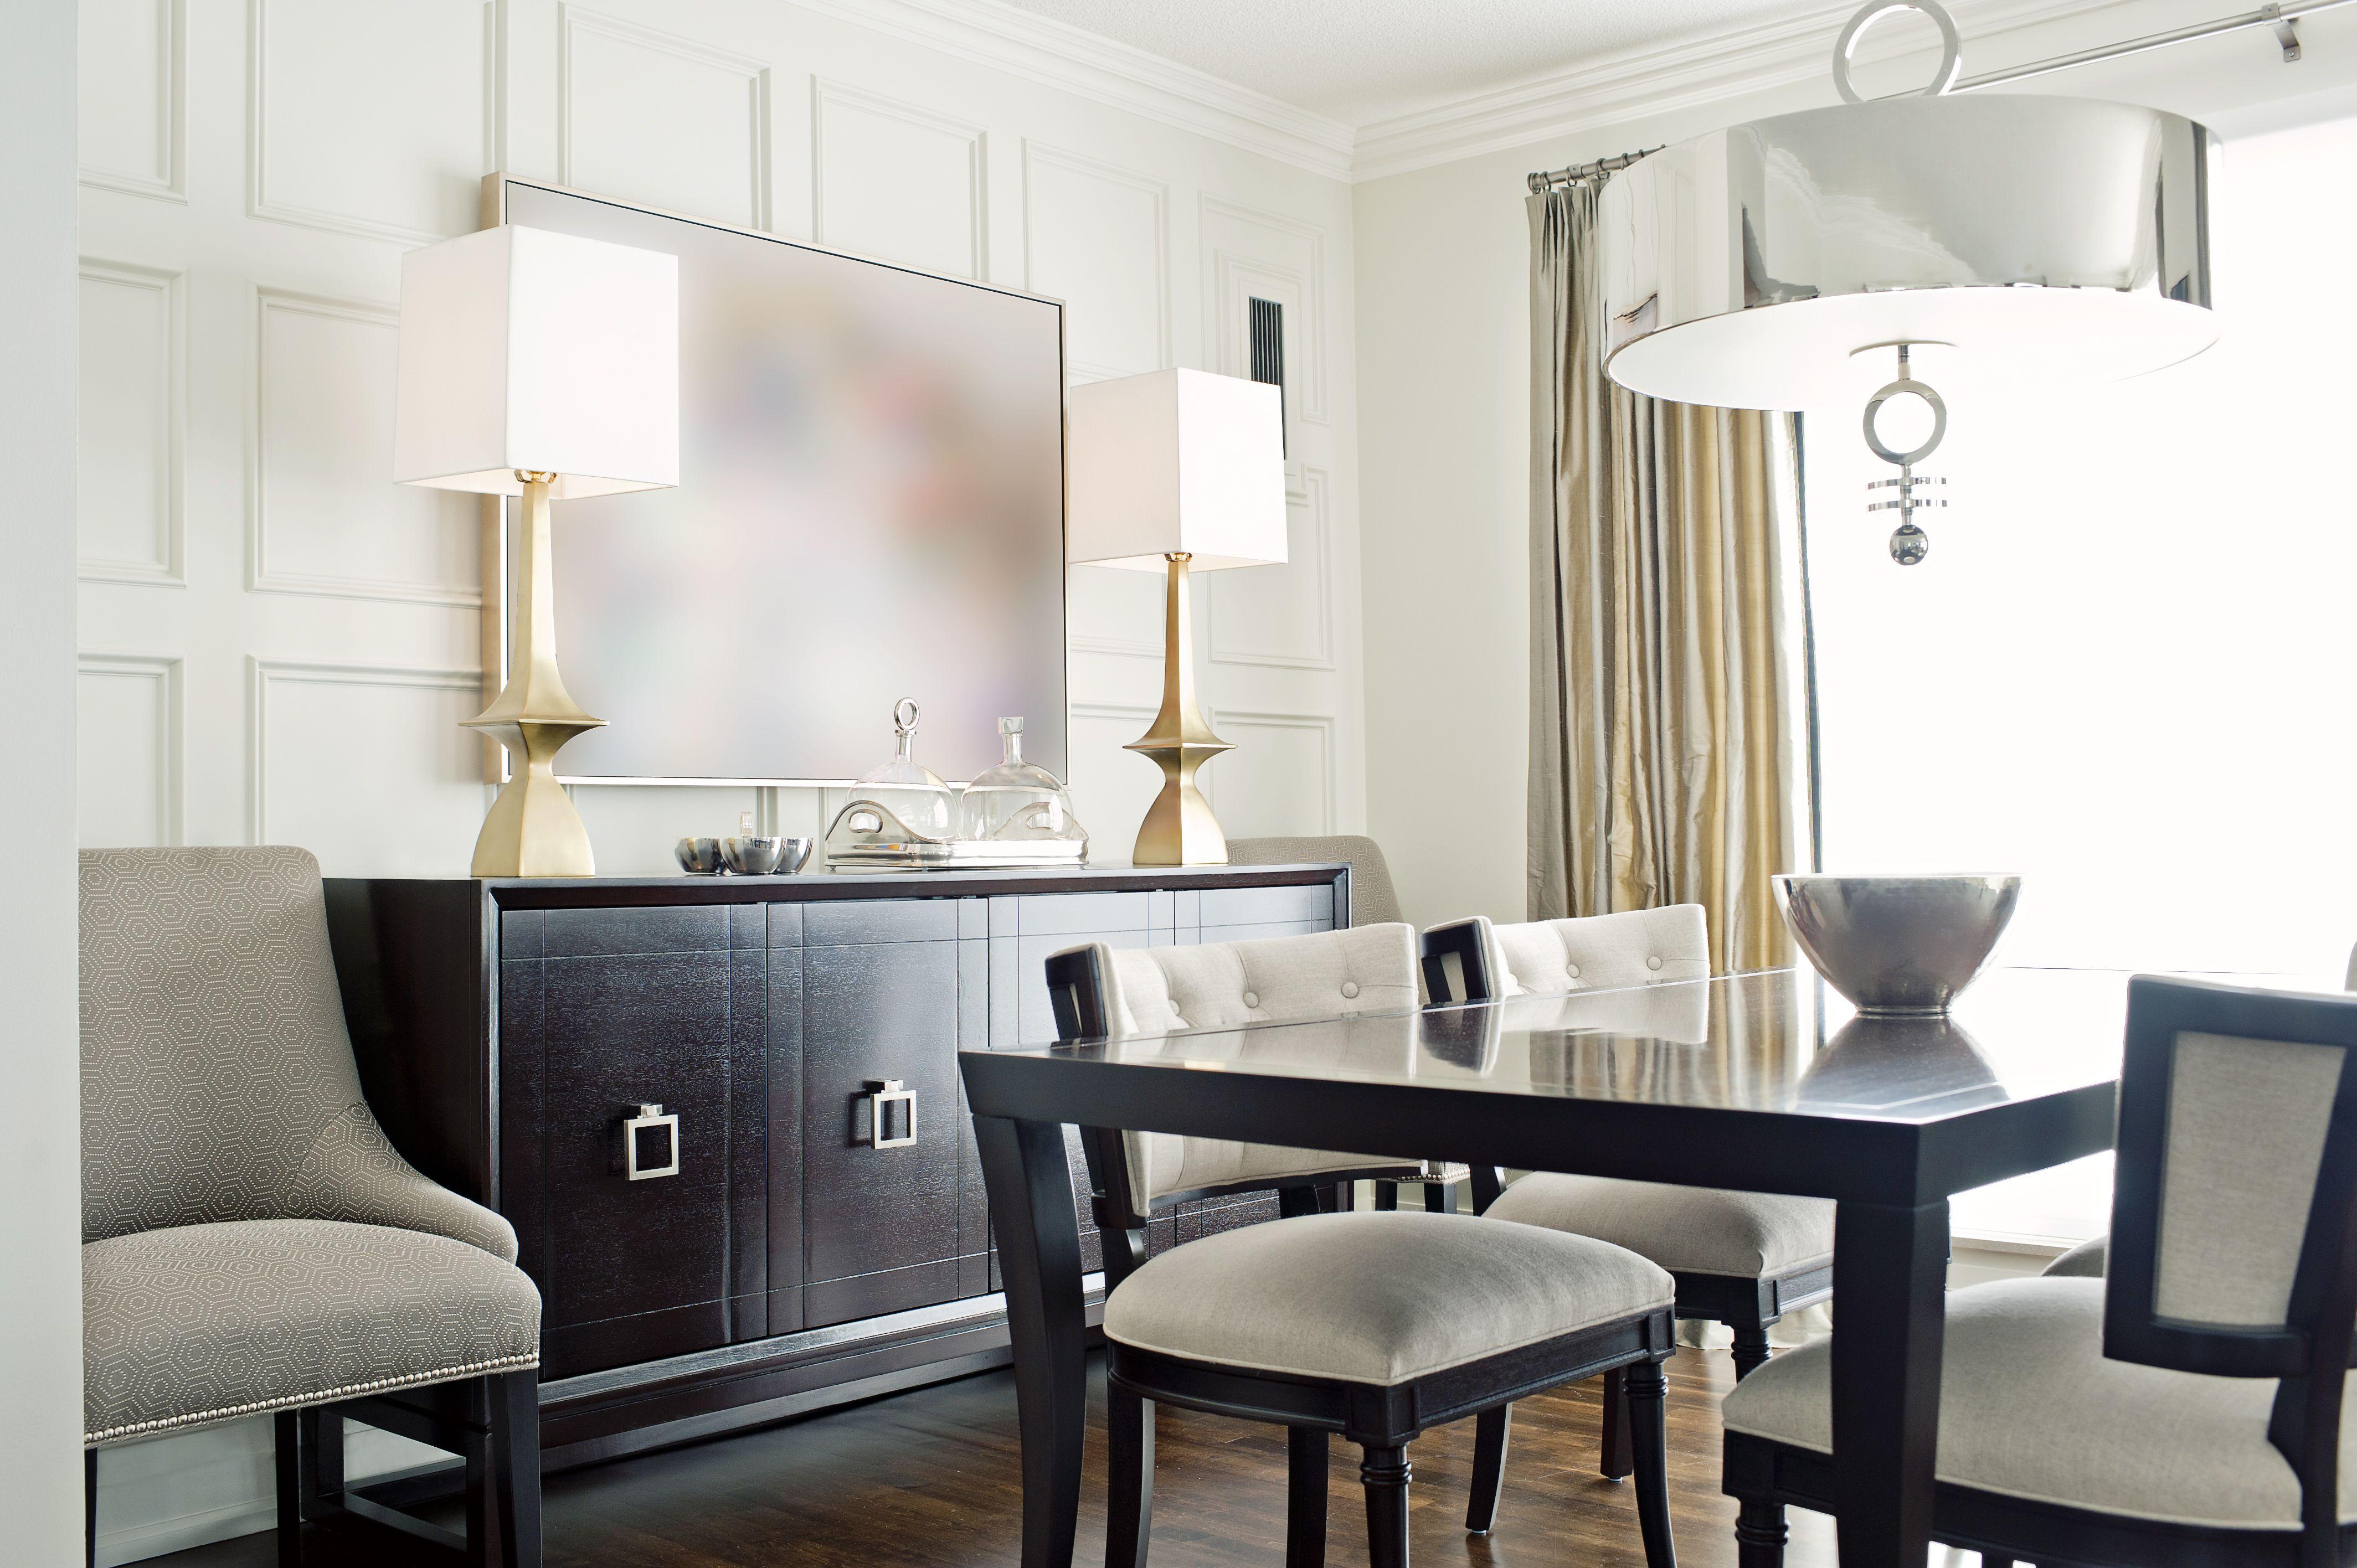 Dining Room designed by Elizabeth Metcalfe Interiors